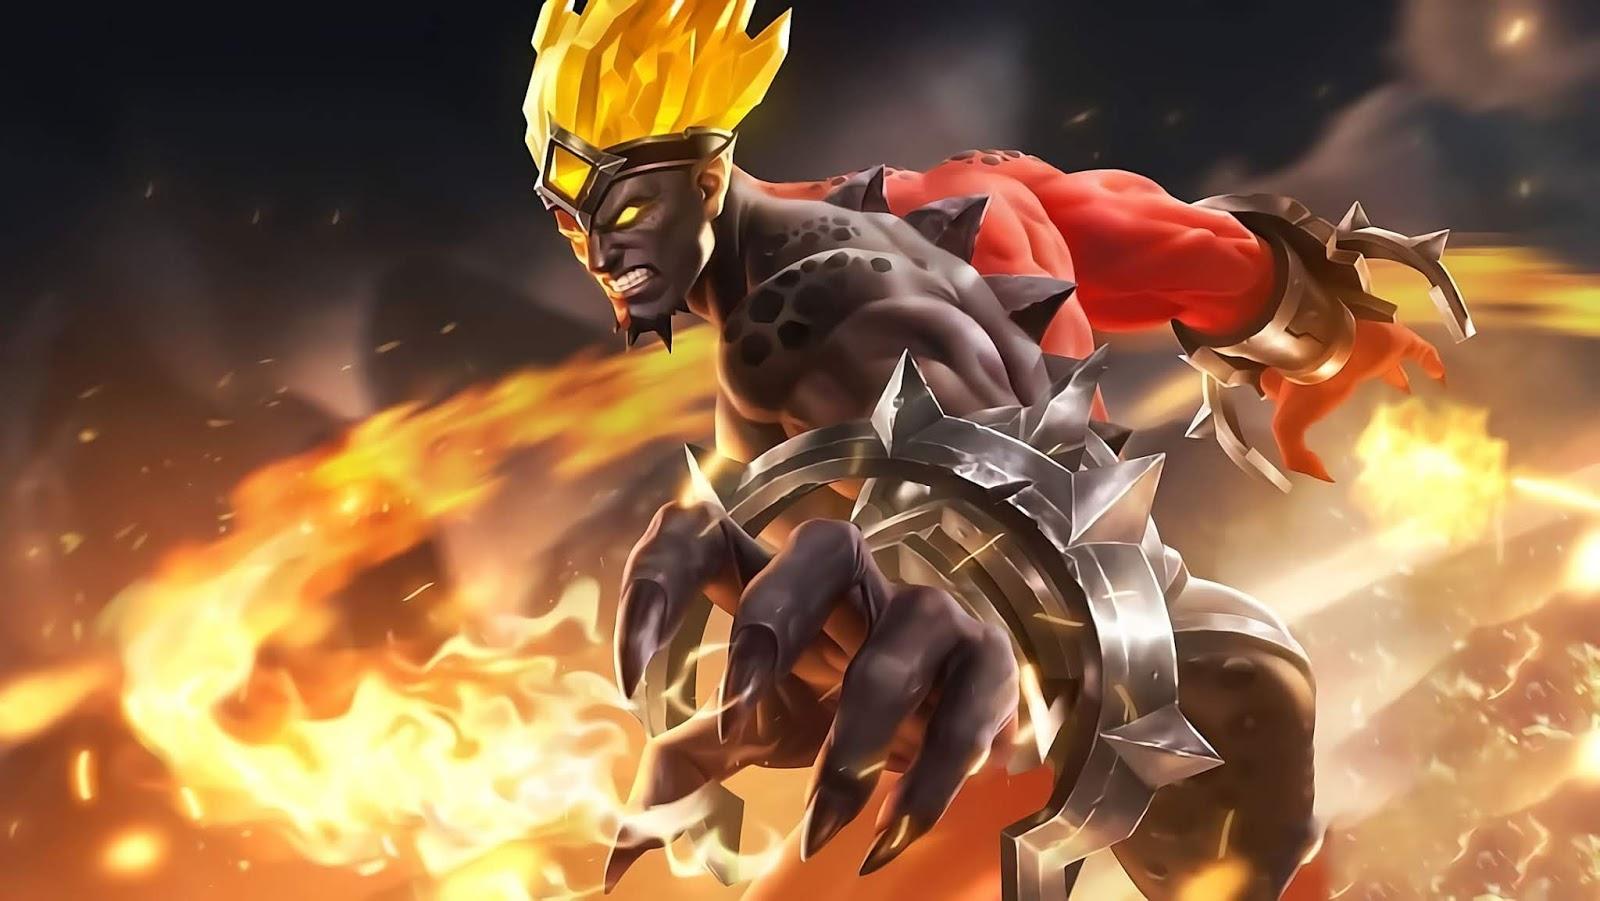 Wallpaper Gord Professor of Hell Skin Mobile Legends HD for PC